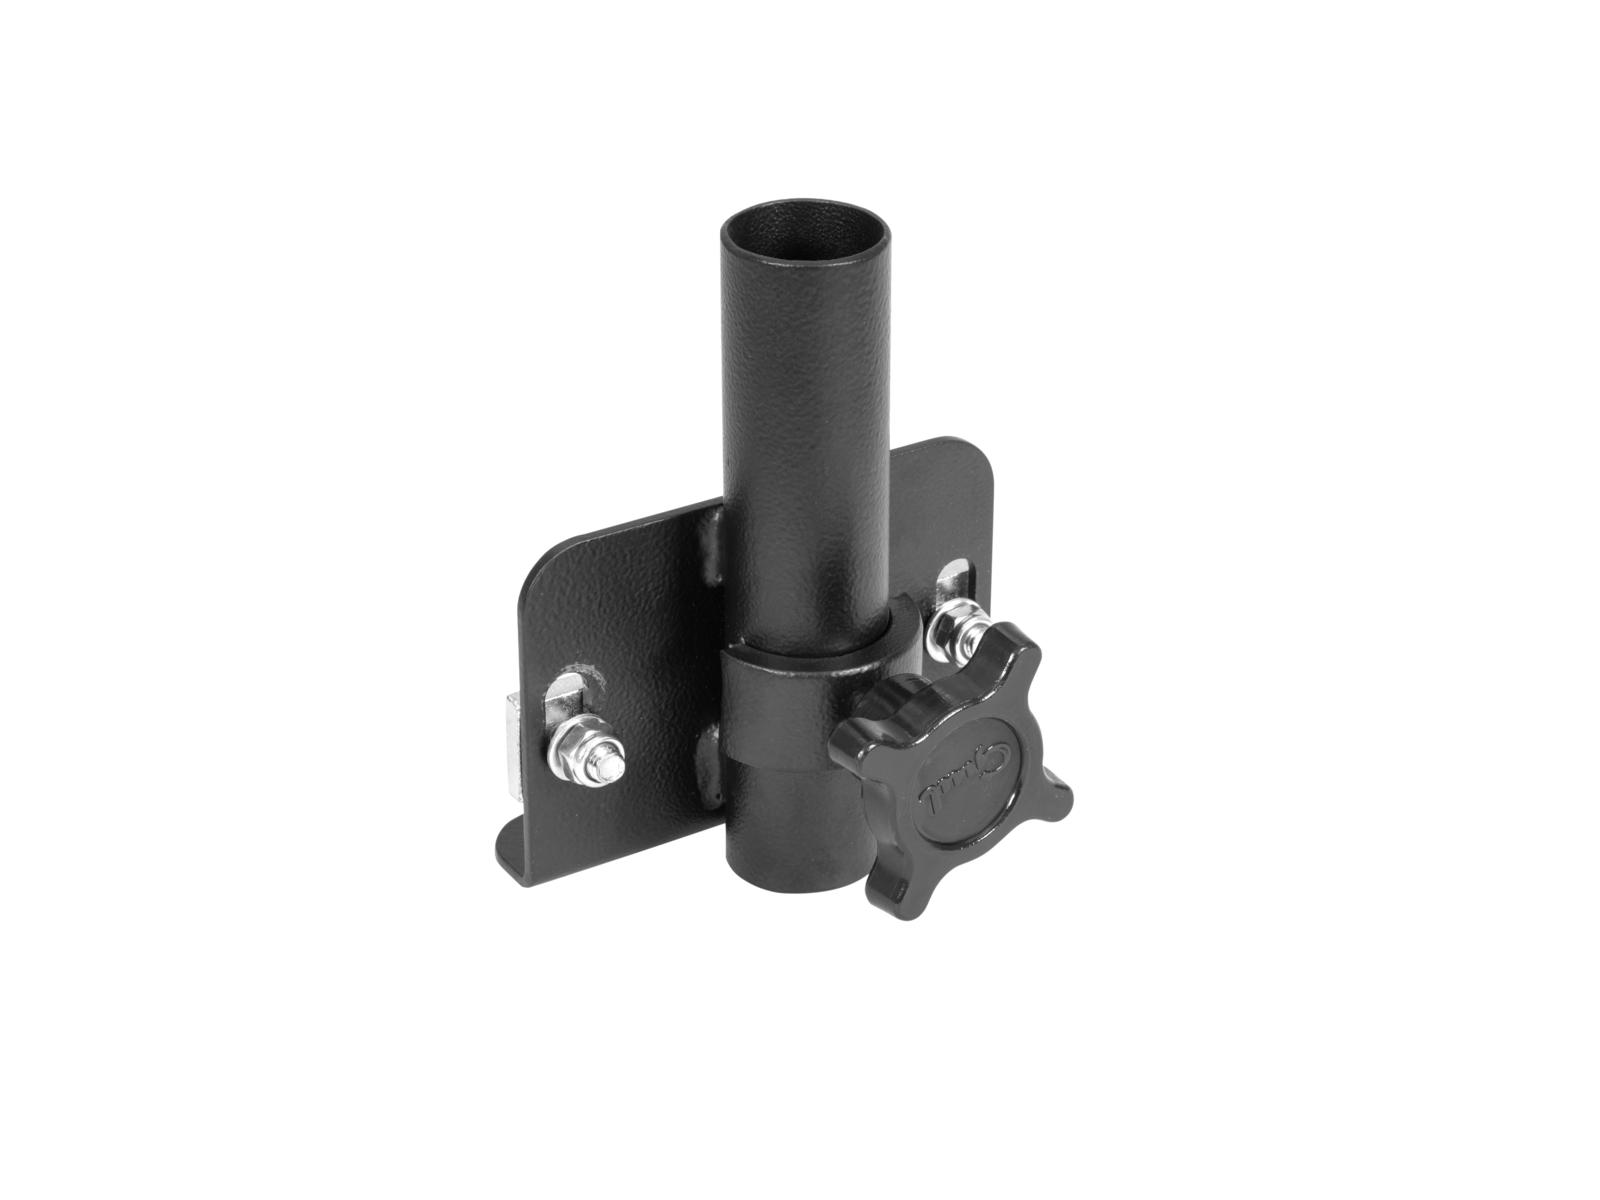 GUIL SB/TM-01/440 Schirmadapter